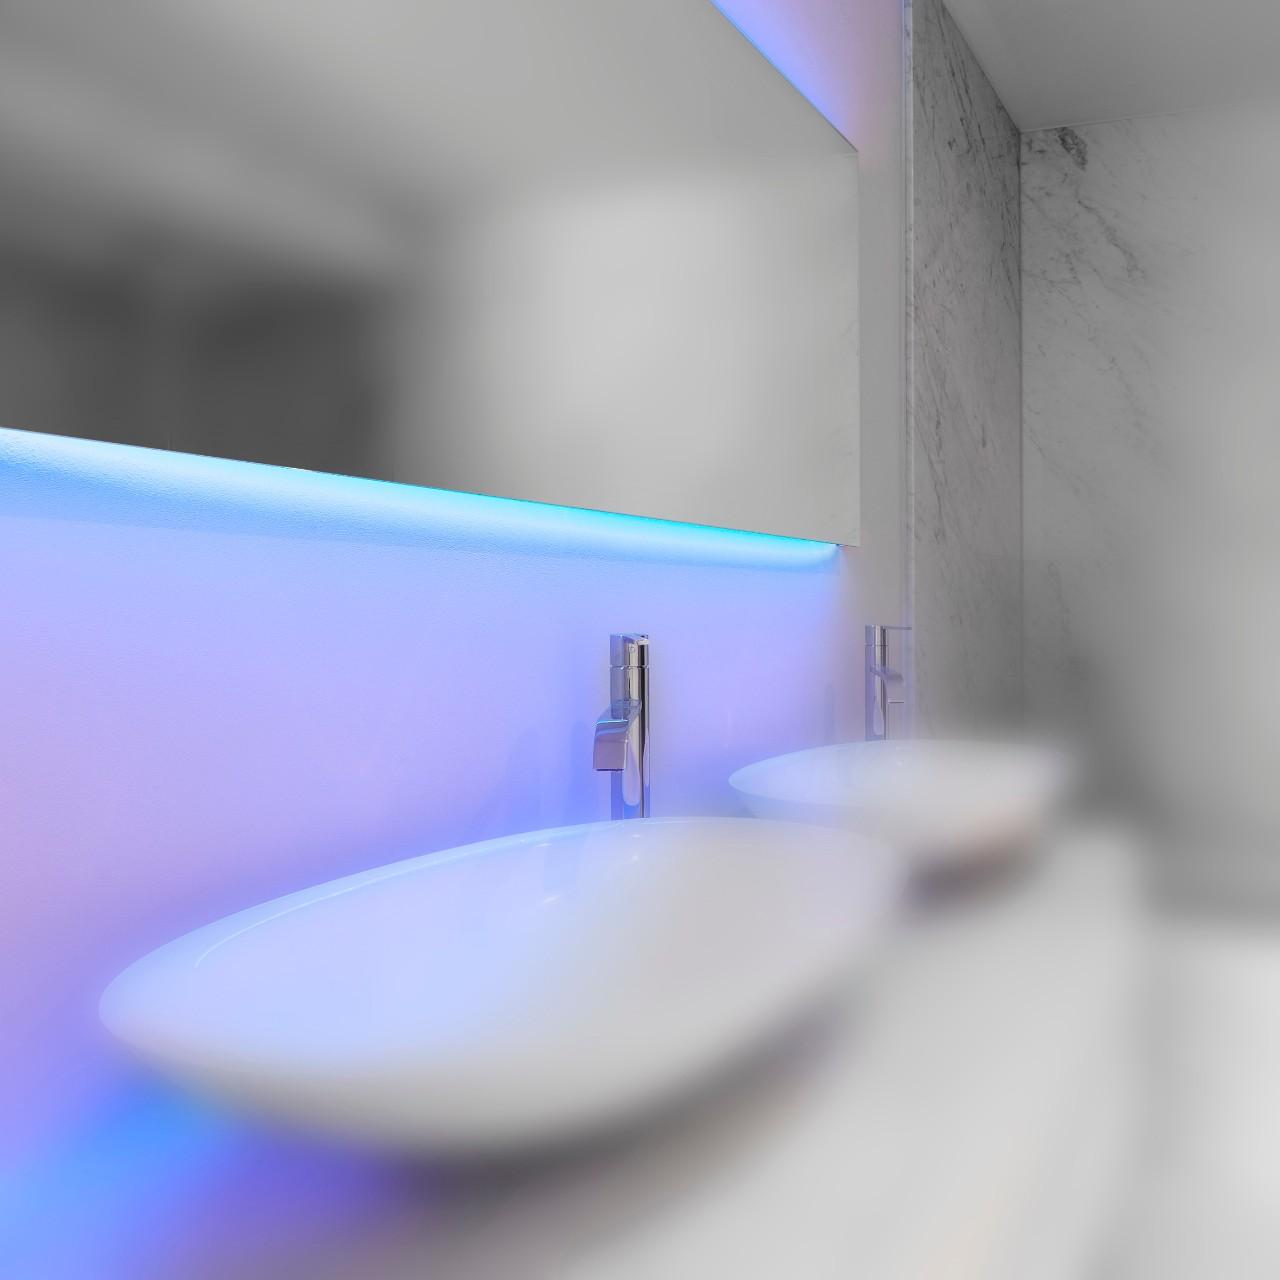 20170316 152725 mooie wastafels badkamer - Een mooie badkamer ...